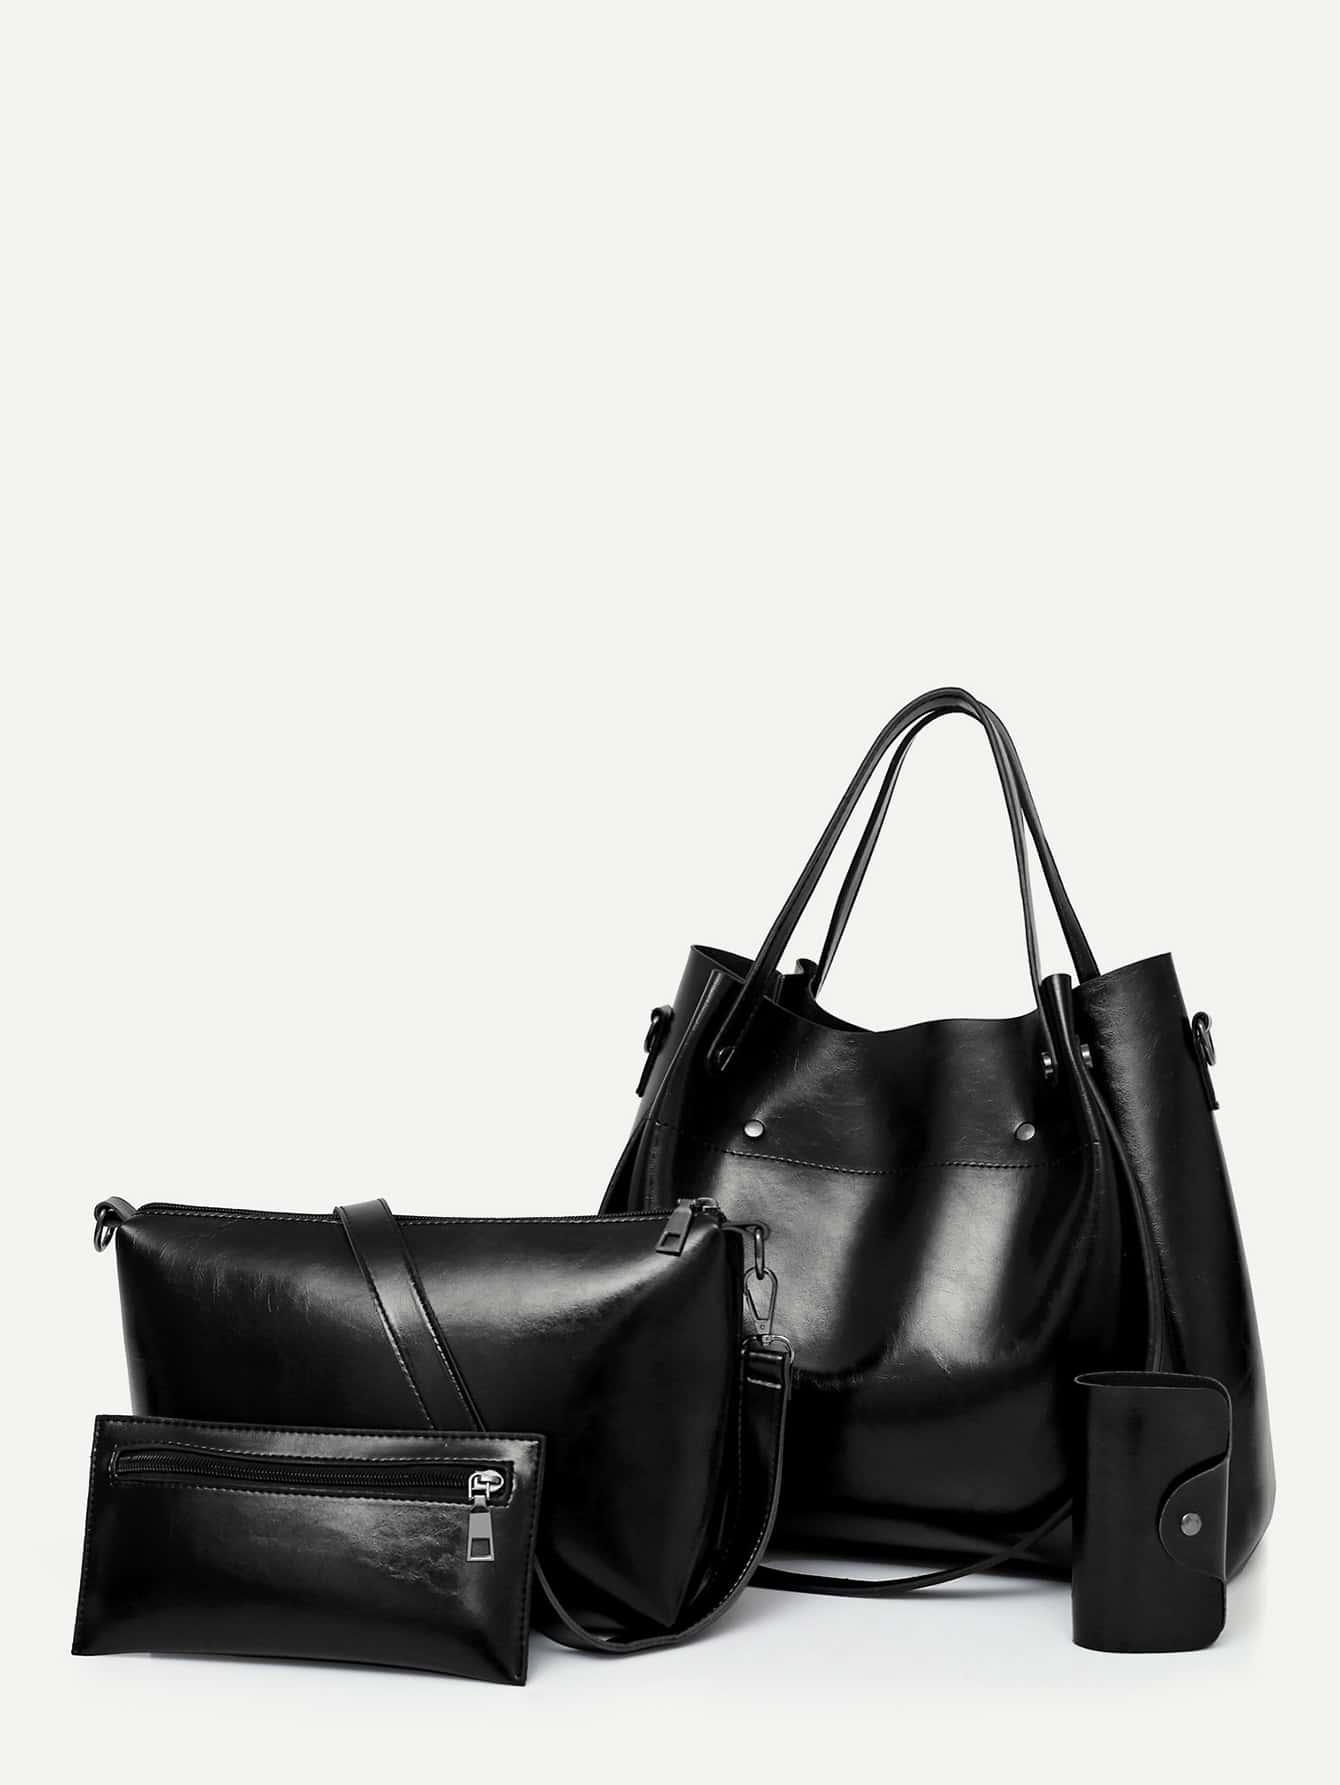 PU Tote Bag Set 4Pcs